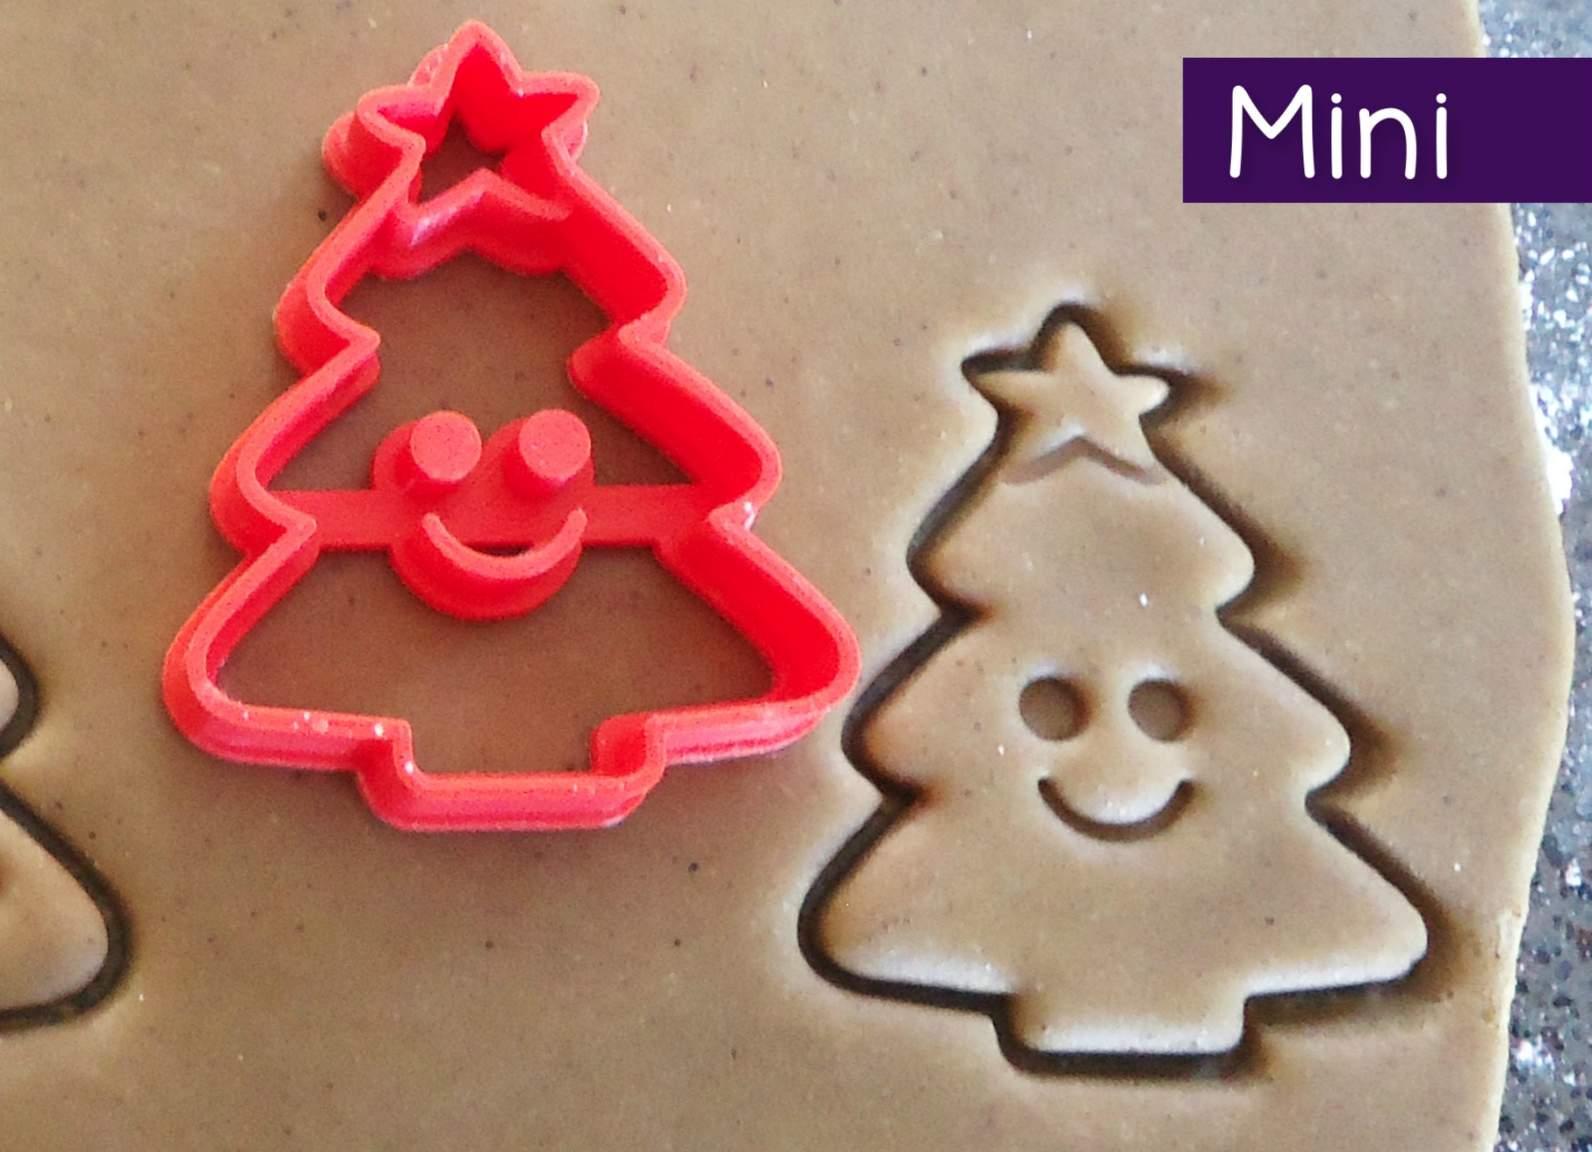 Mini 3d Printed Christmas Tree Cookie Cutter Felt